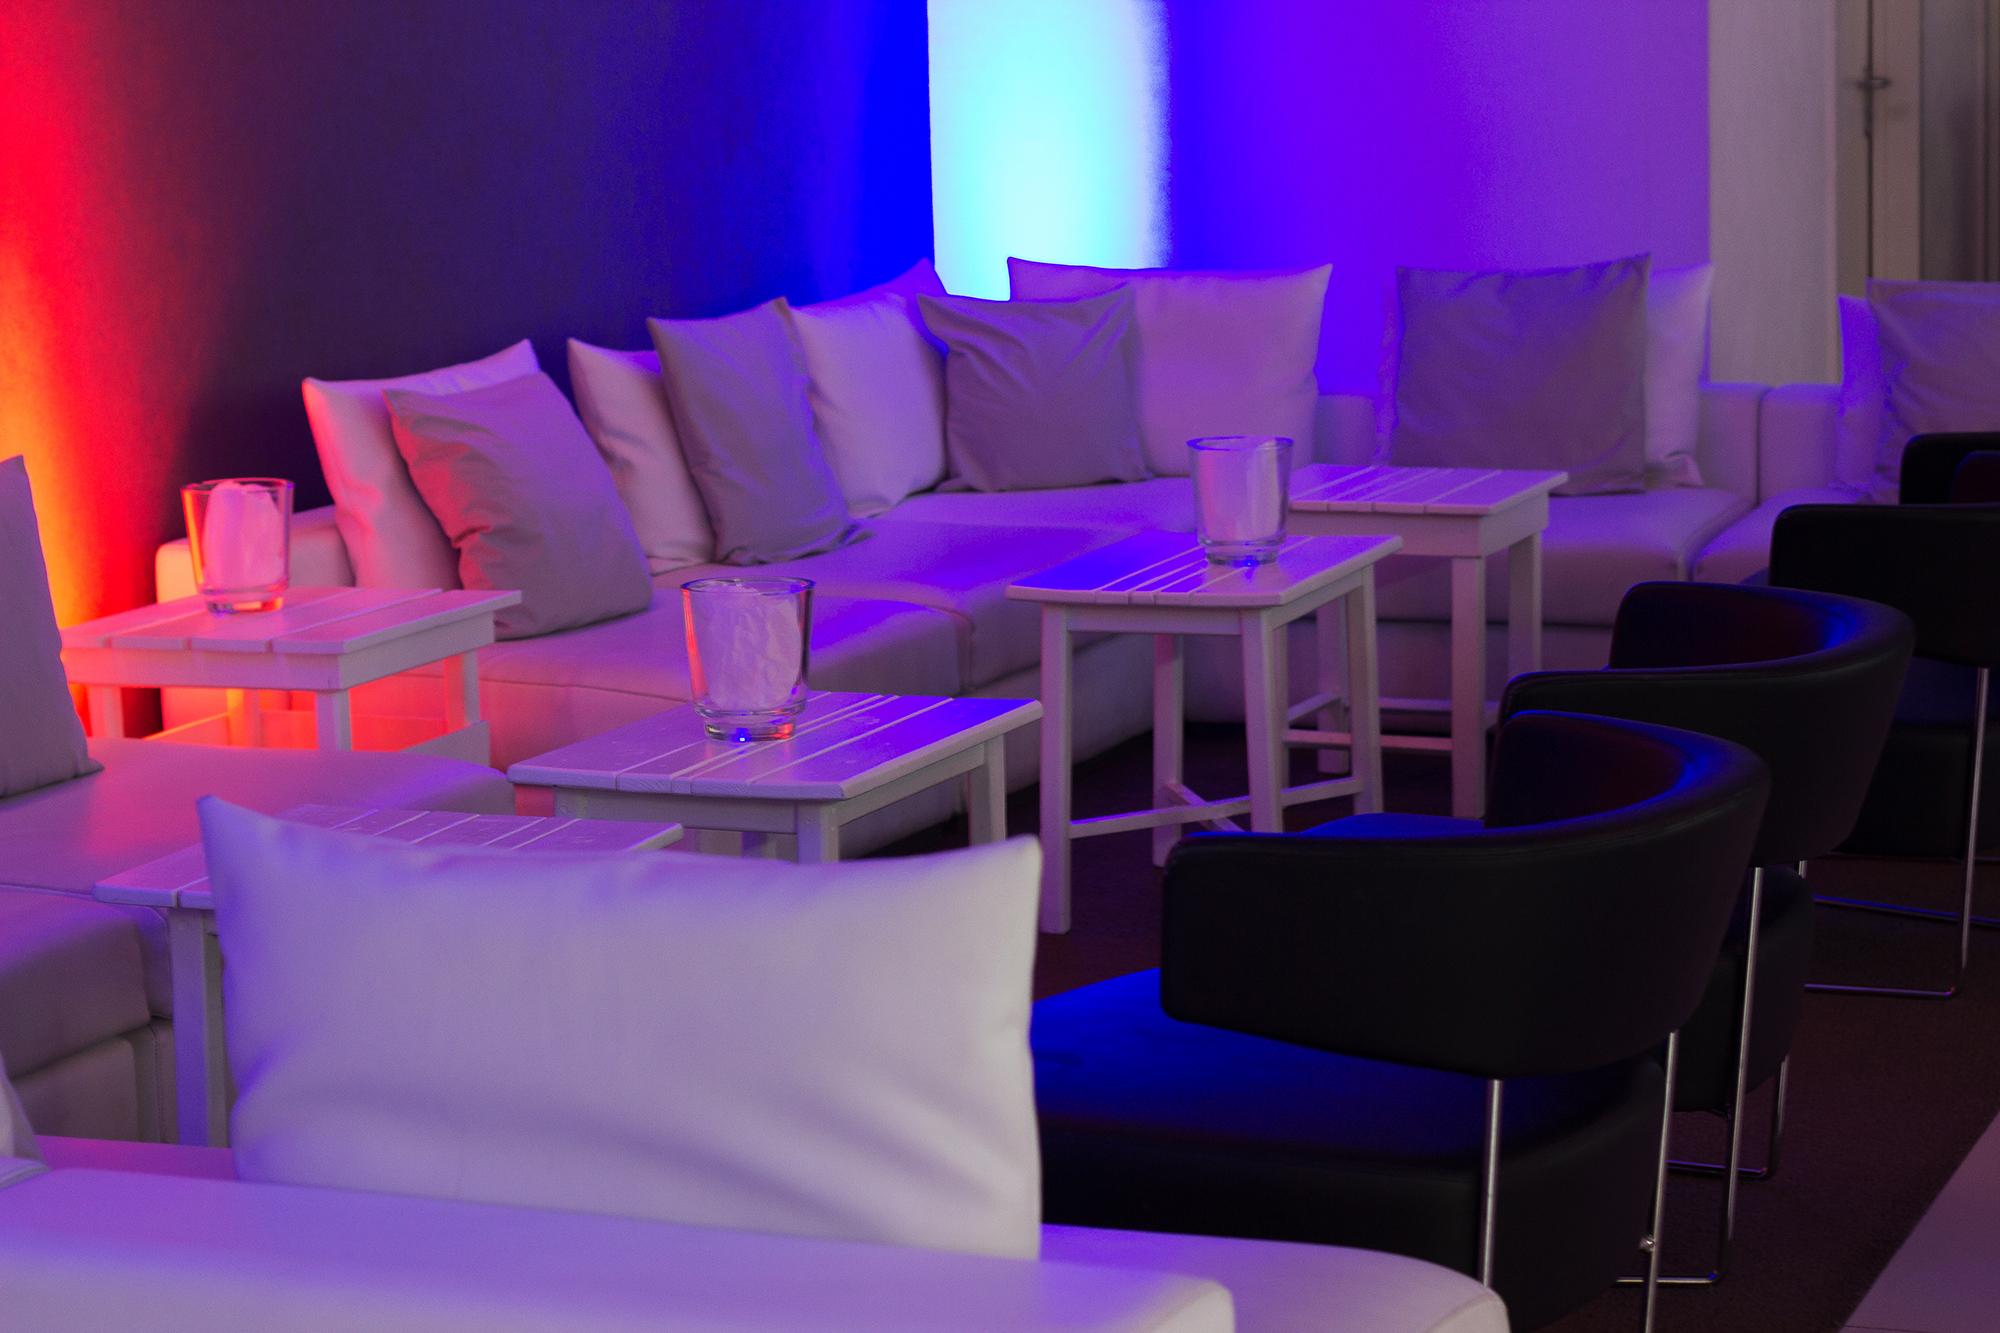 Hotel Meliá Berlin, Lounge & Bar, Hotelbericht